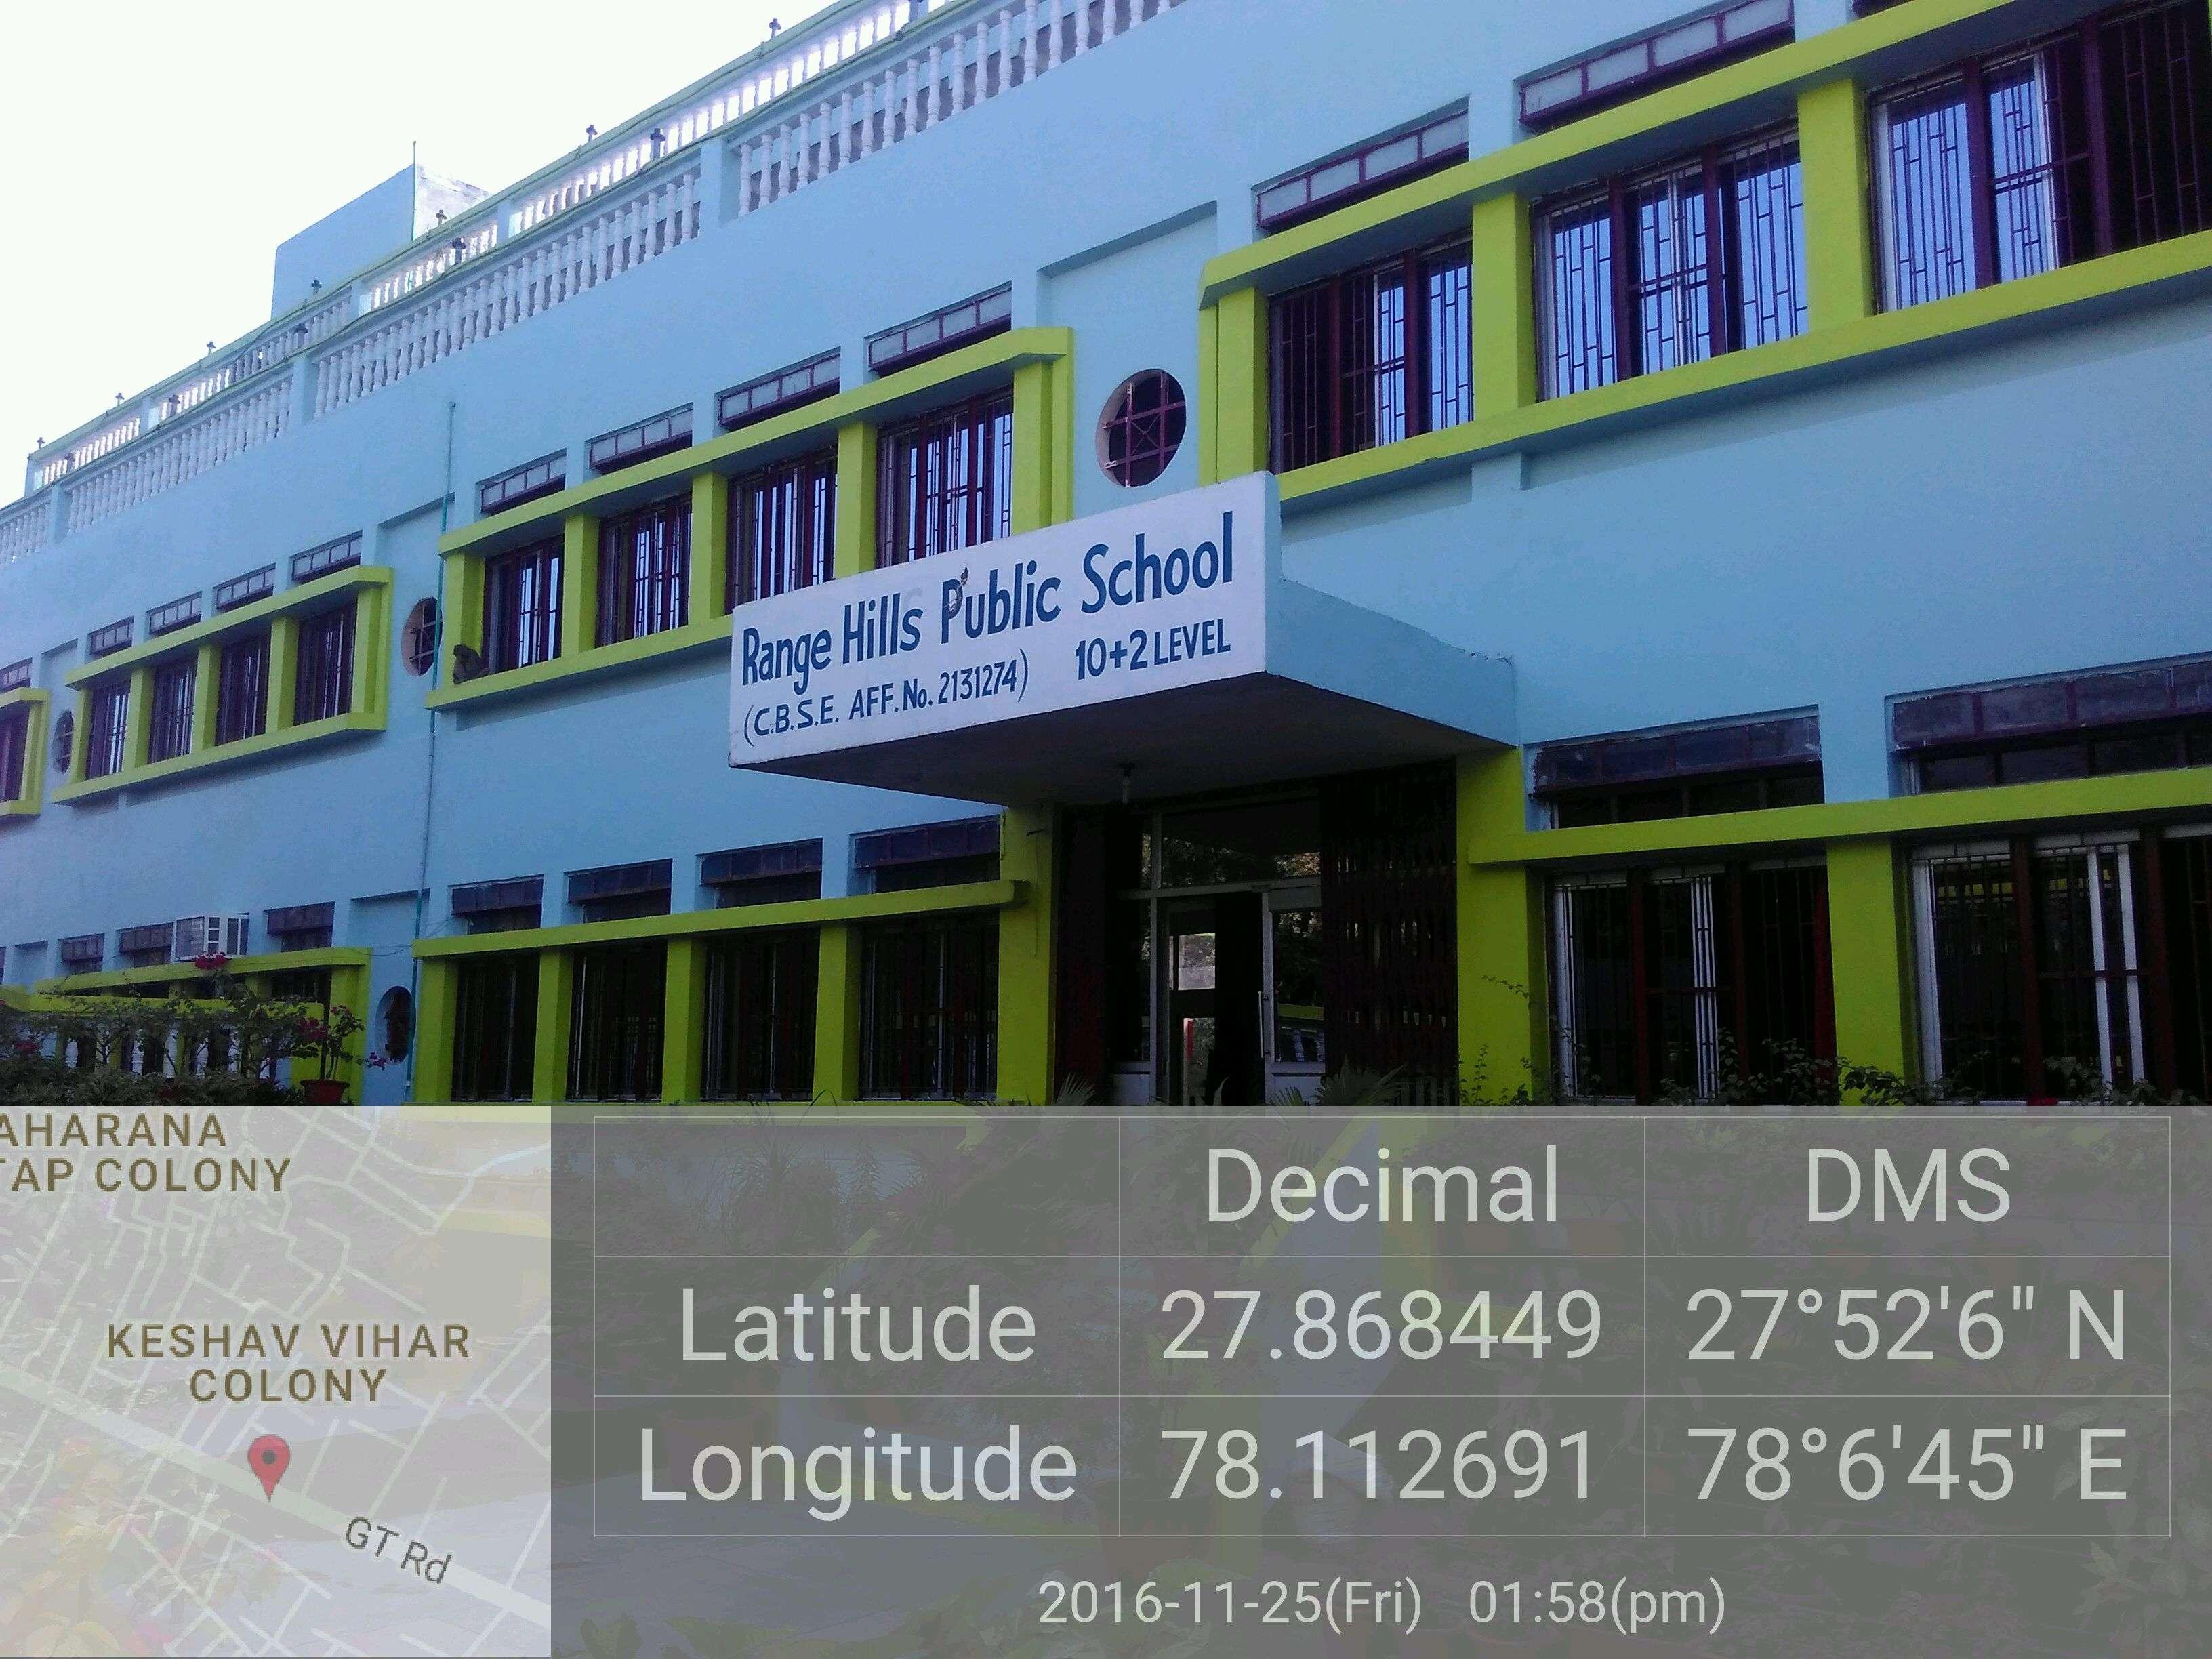 RANGE HILLS PUBLIC SCHOOL DHANIPUR G T ROAD 2131274